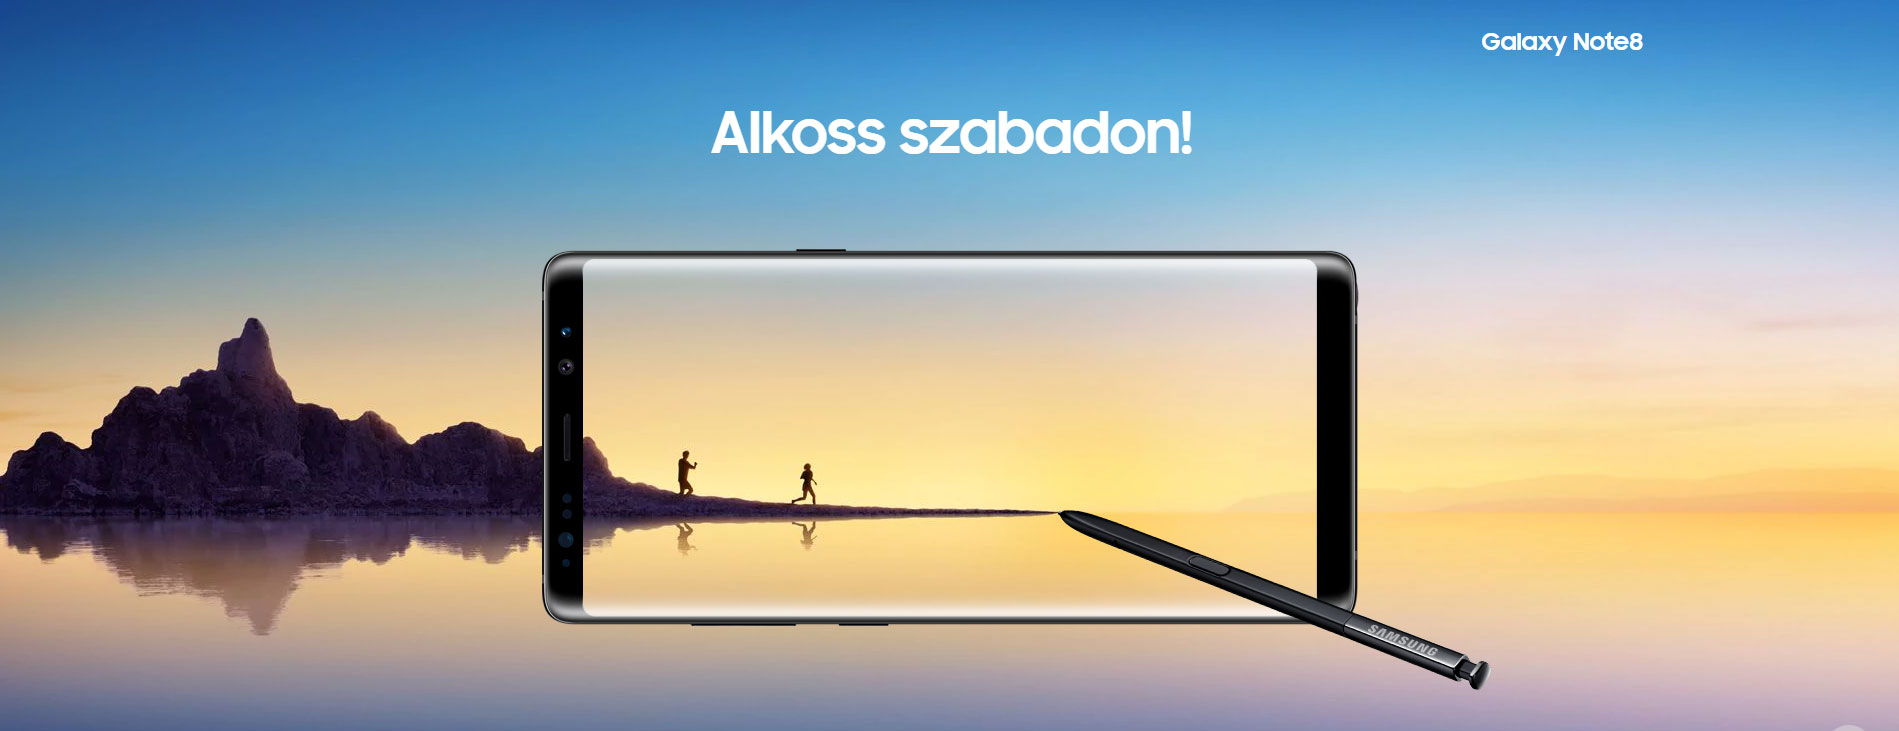 új okostelefon: Samsung Galaxy Note 8